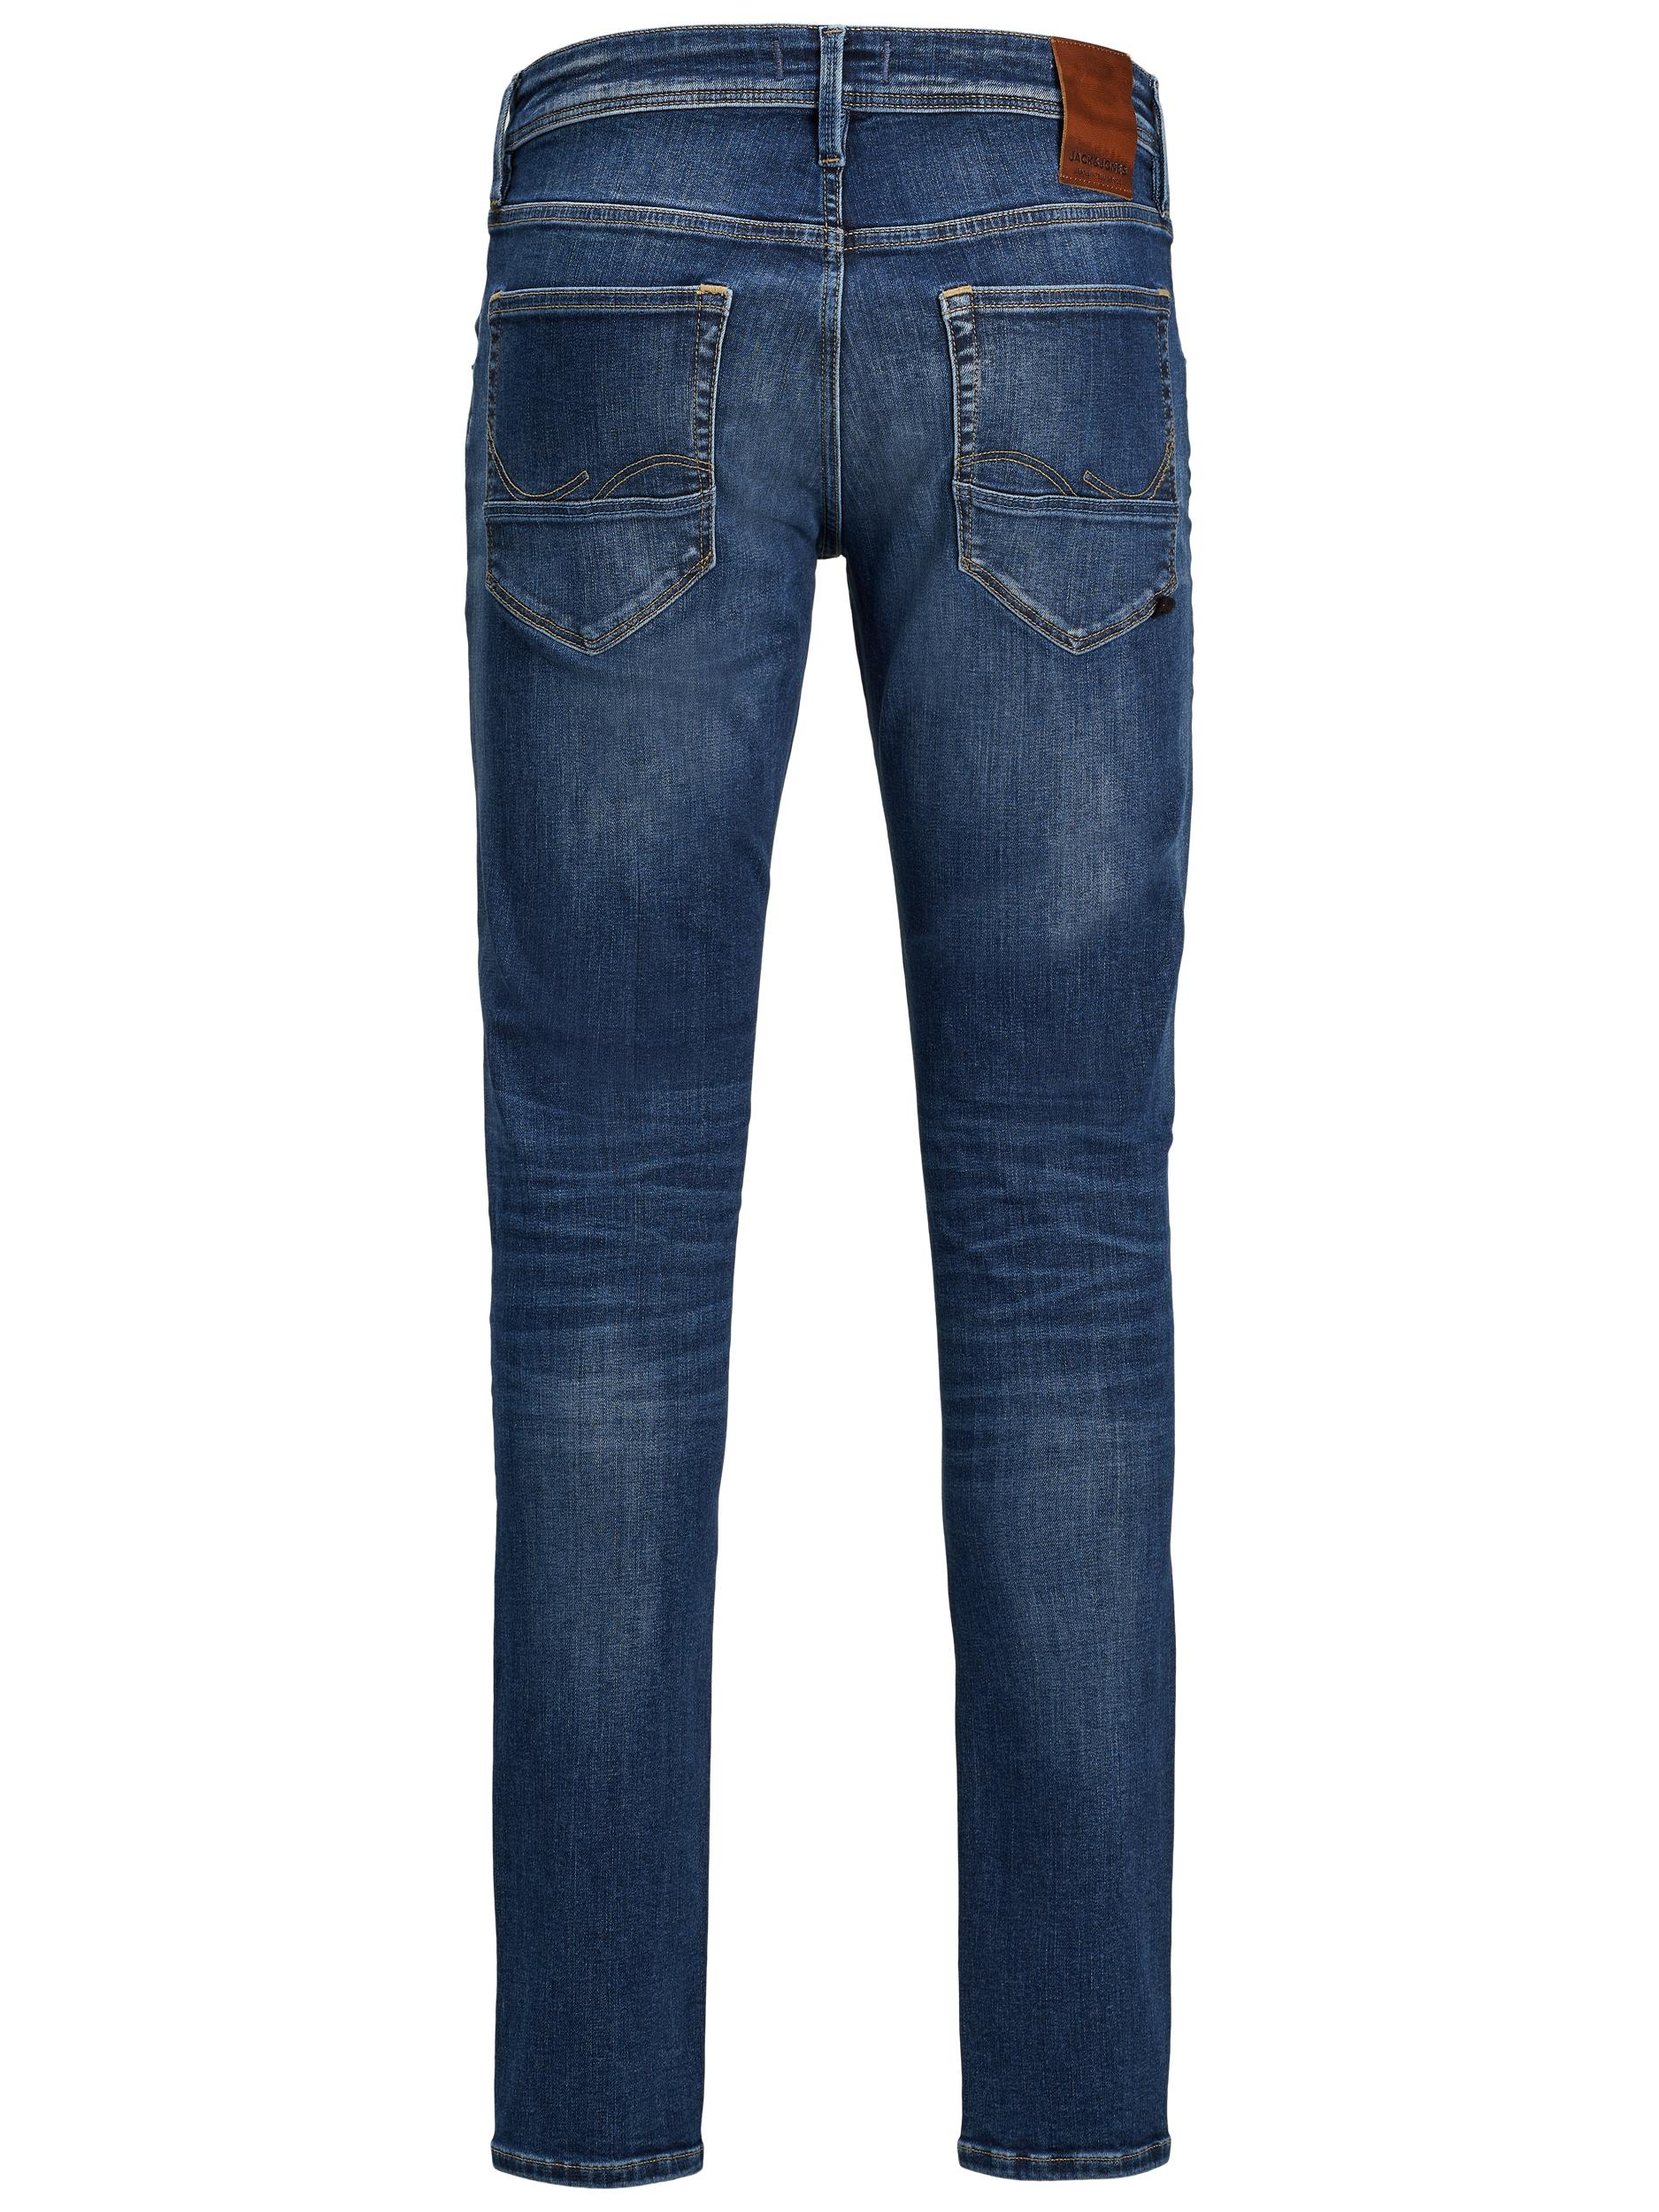 Jack & Jones Glen Fox jeans, blue denim, 33/32